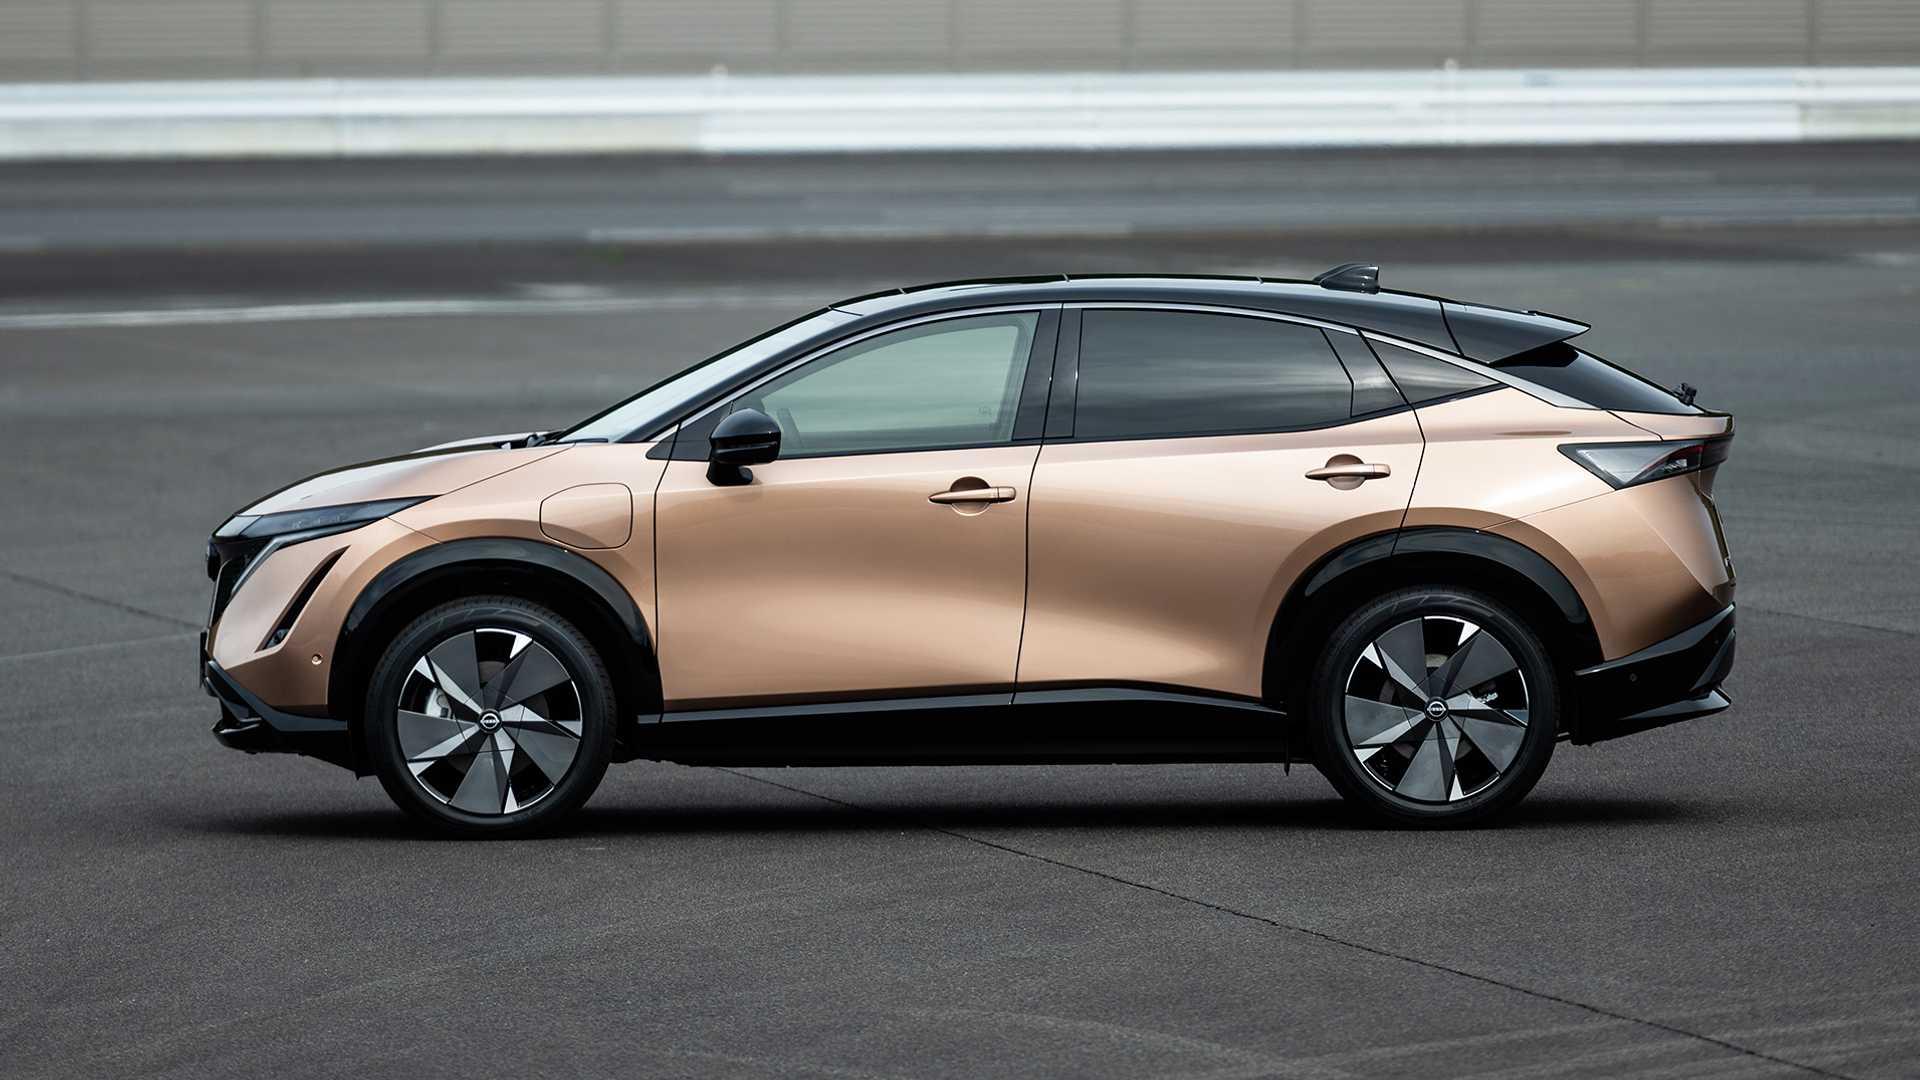 Nissan Ariya Electric SUV Unveiled With 480 Km Driving Range